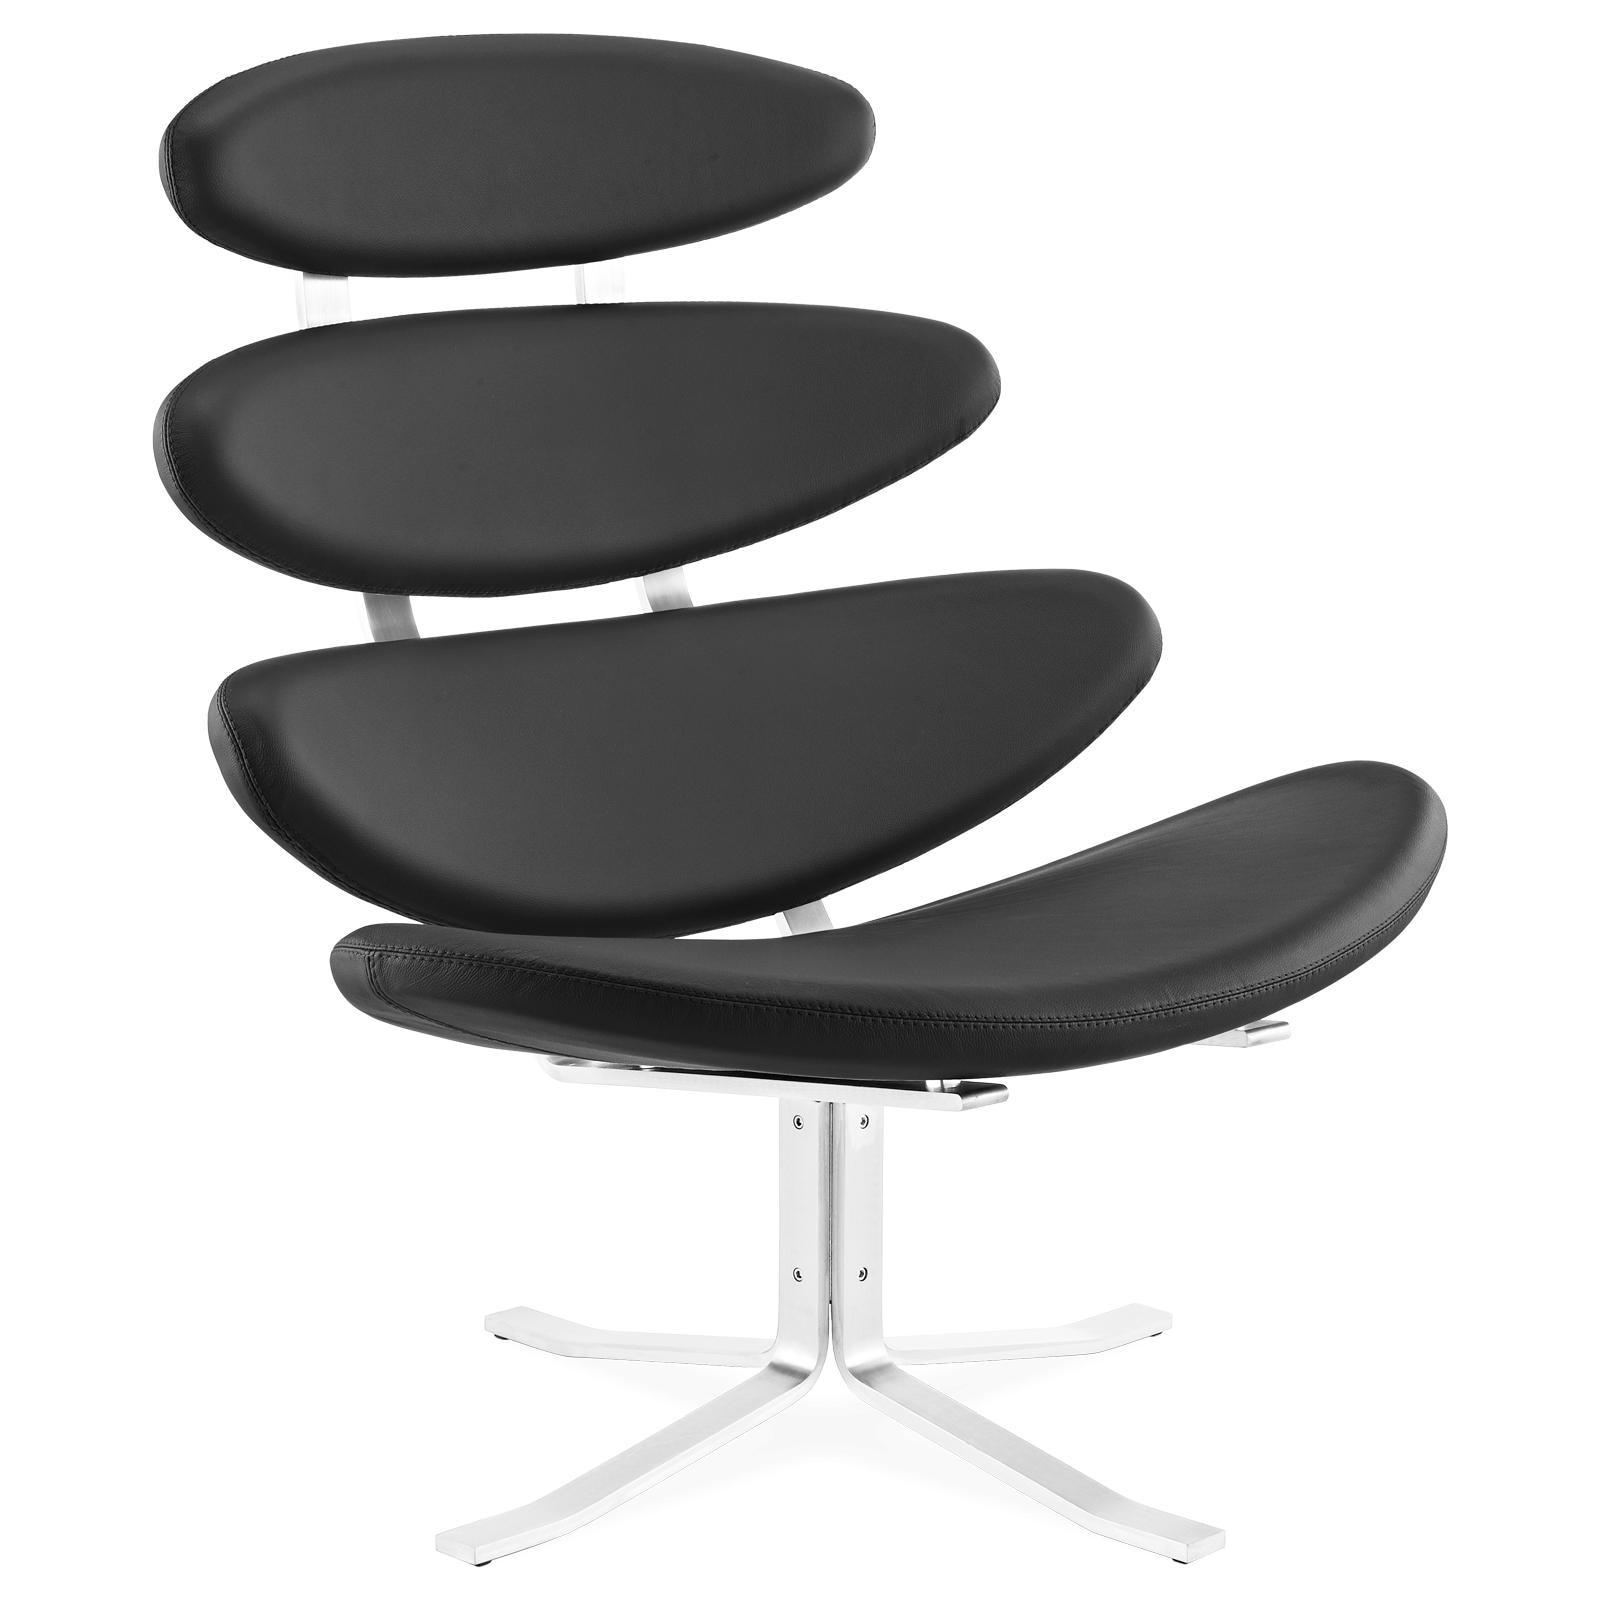 Mid century modern style replica corona chair black